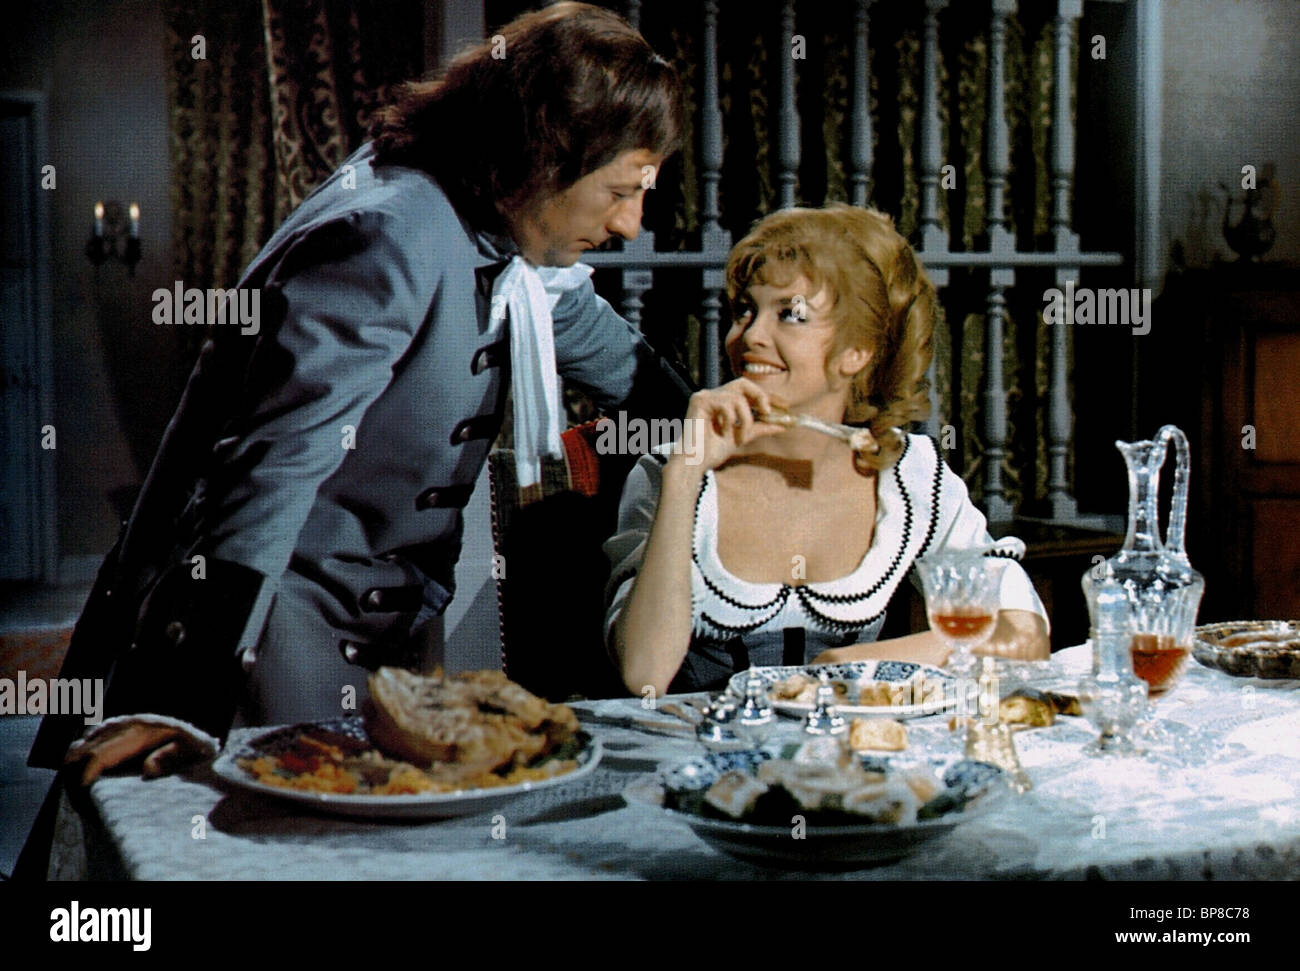 michele mercier angelique marquise des anges 1964 stock photo royalty free image 30918028 alamy